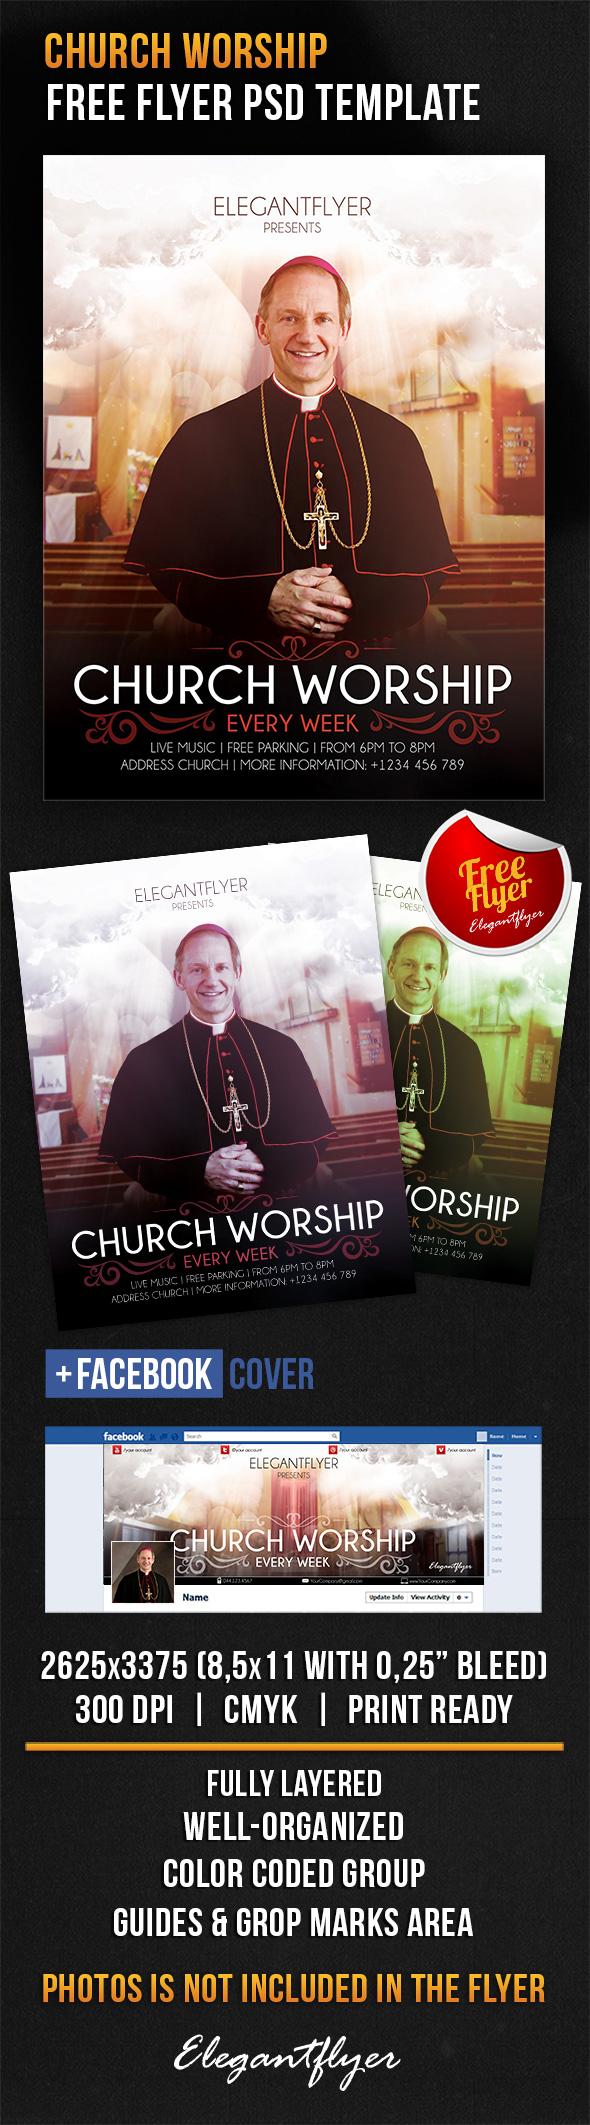 Facebook Free Church Flyer Templates